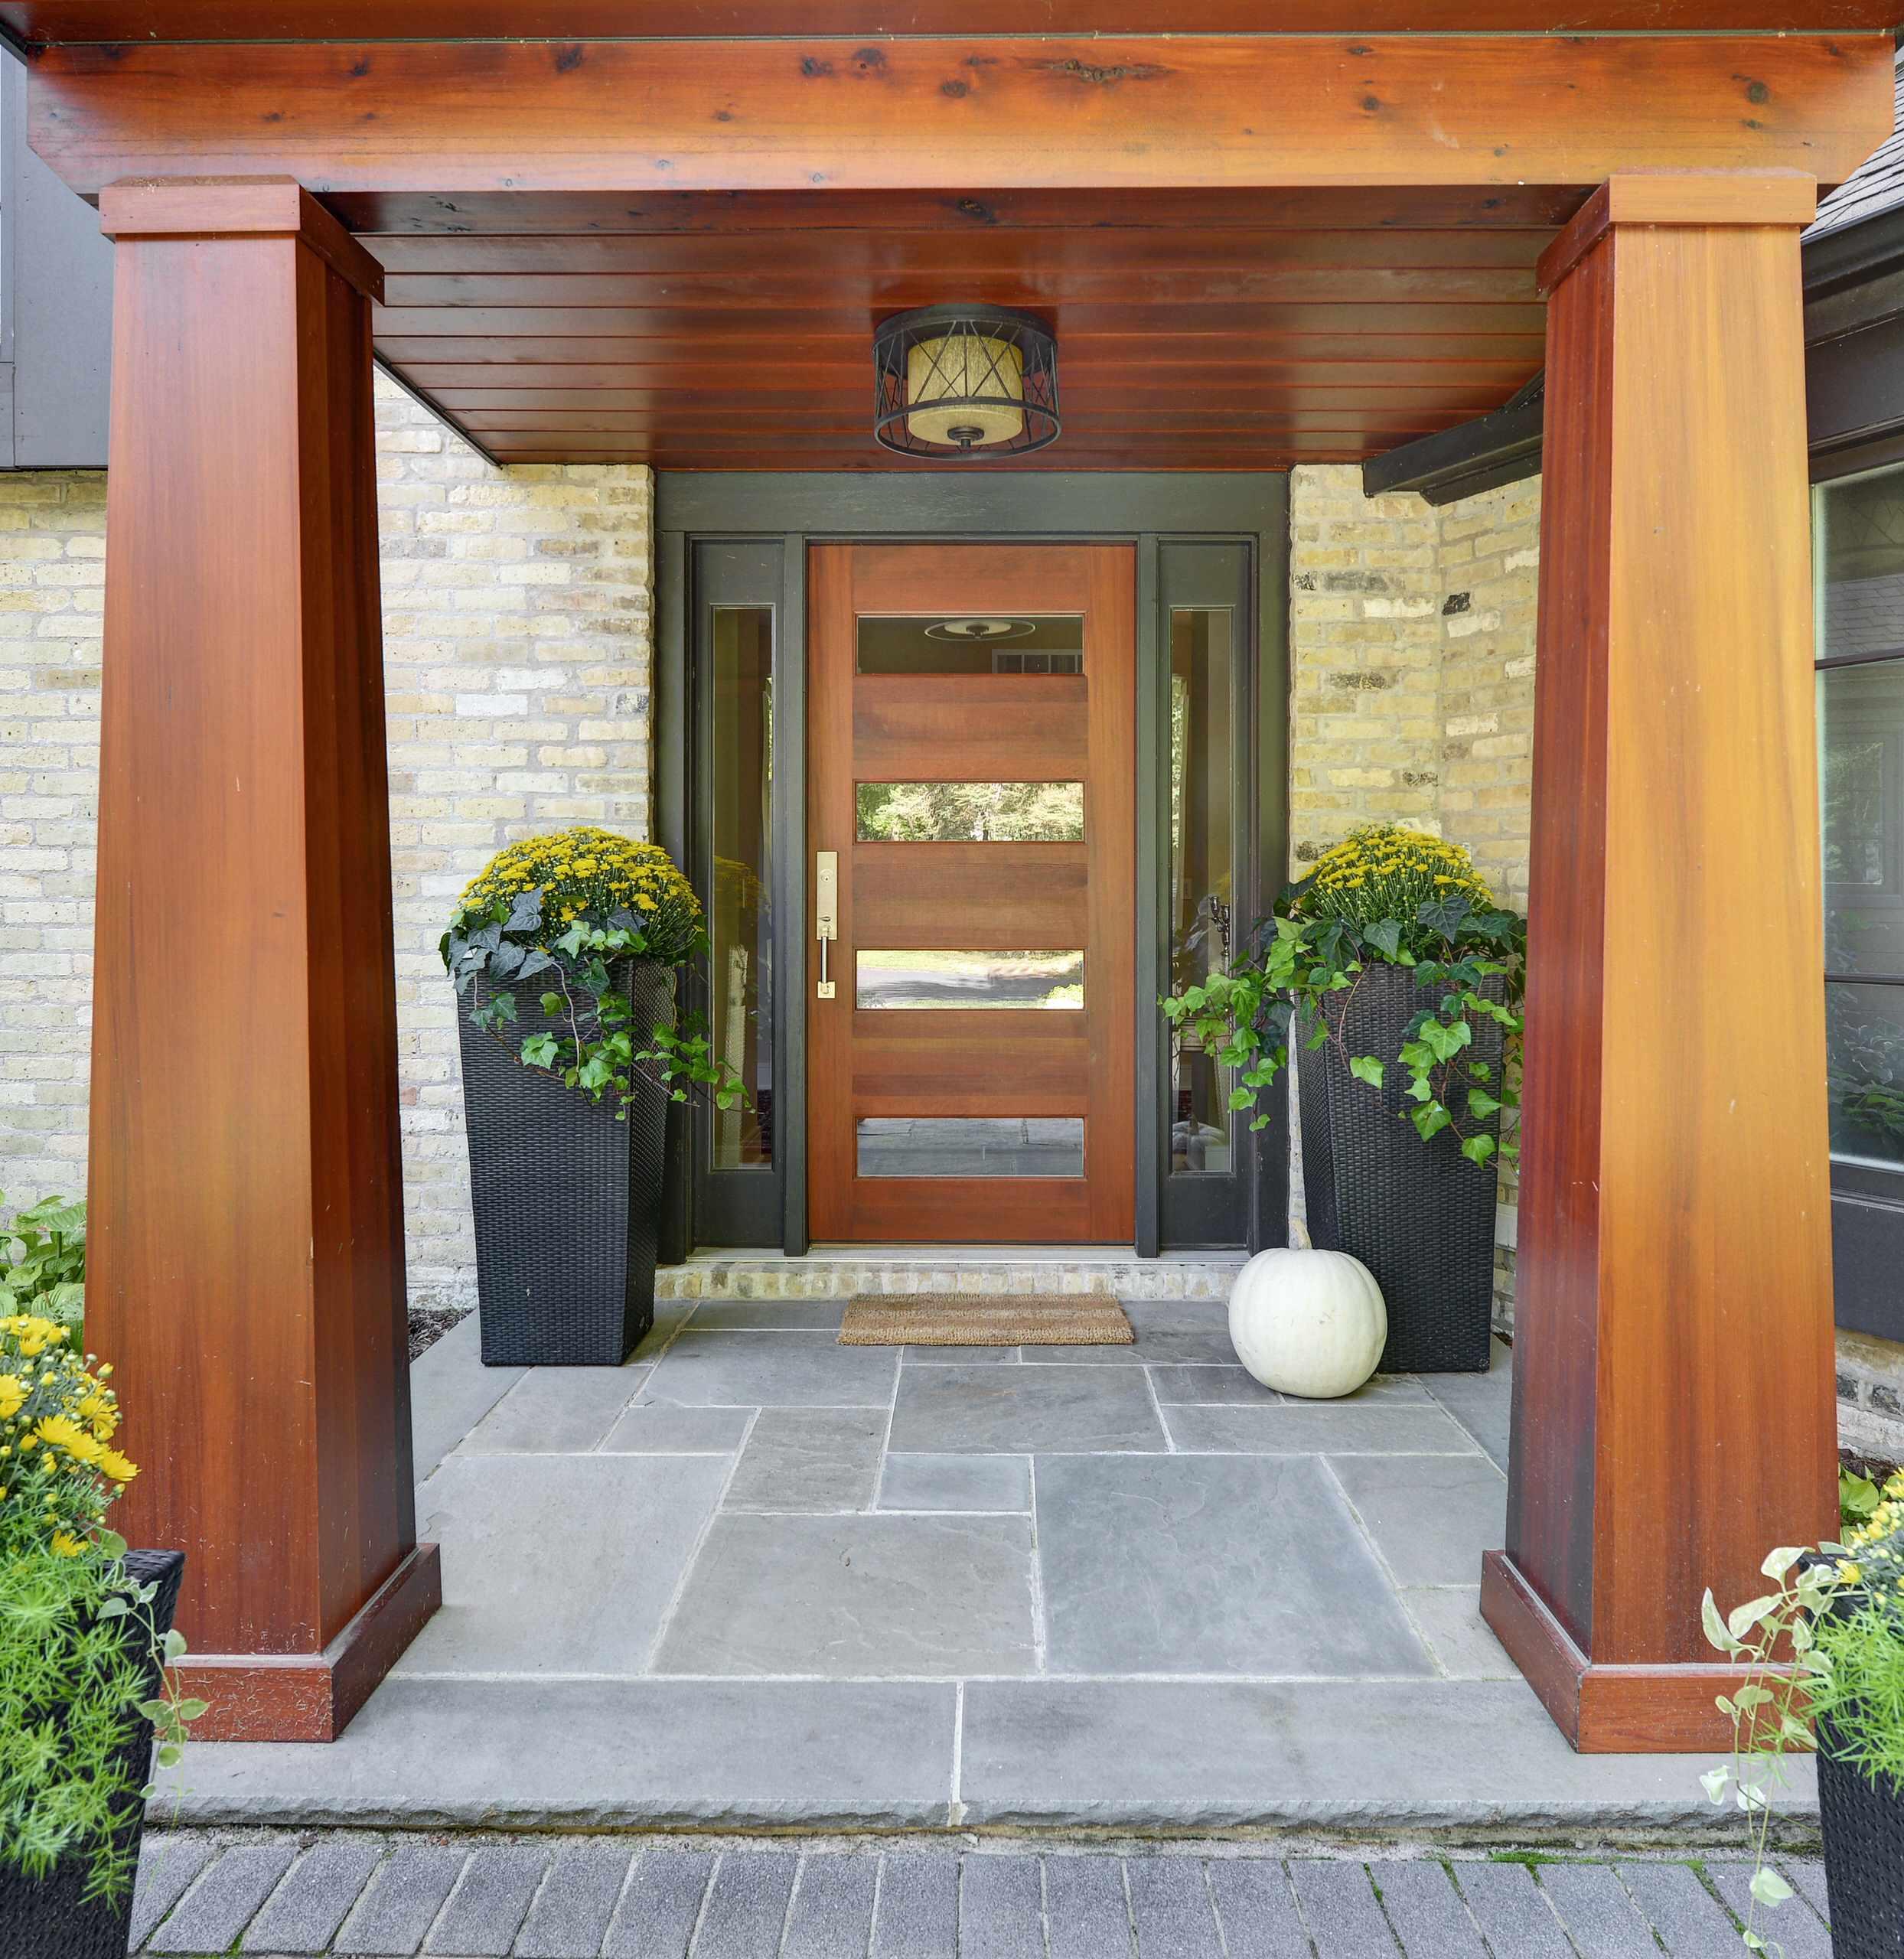 75 Beautiful Front Door Pictures Ideas January 2021 Houzz